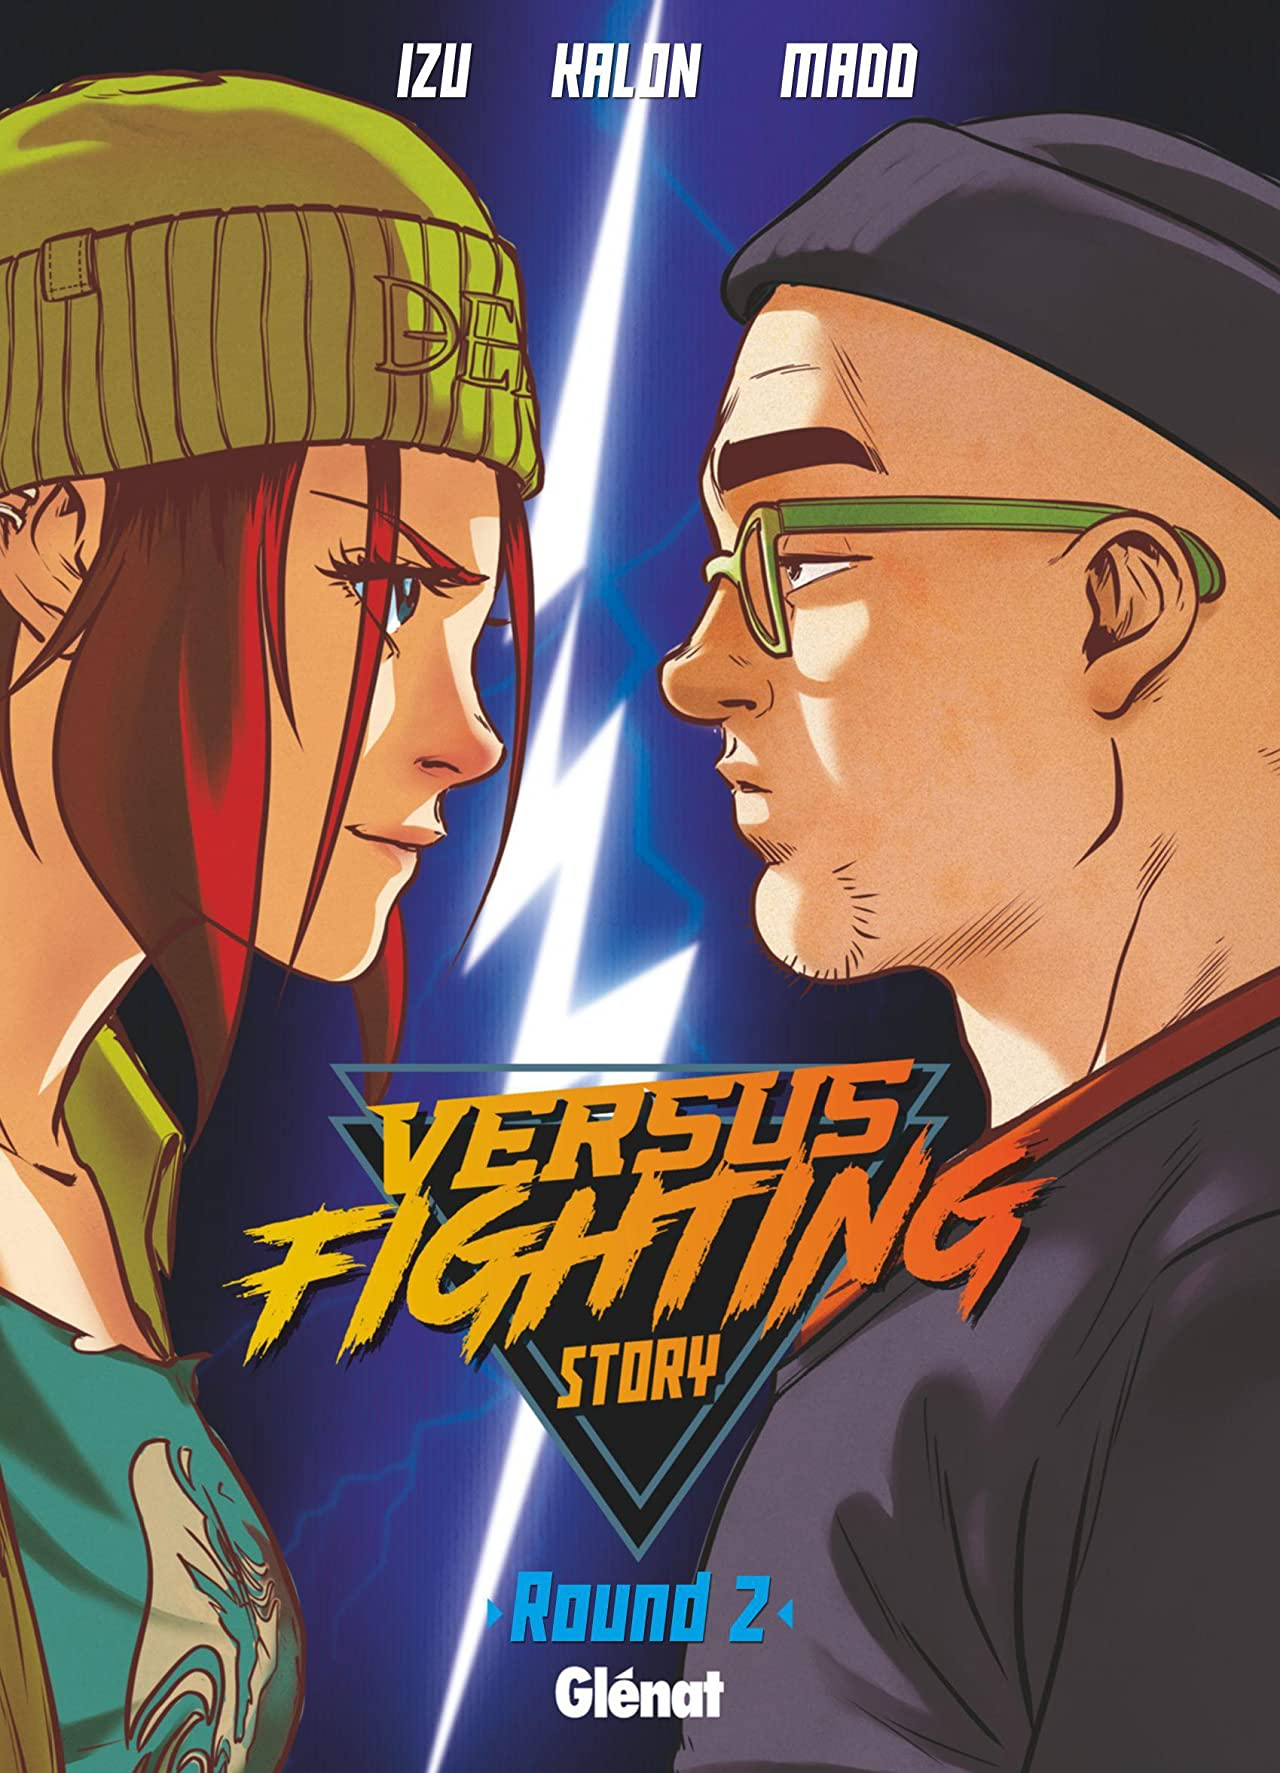 Versus Fighting Story Vol. 2